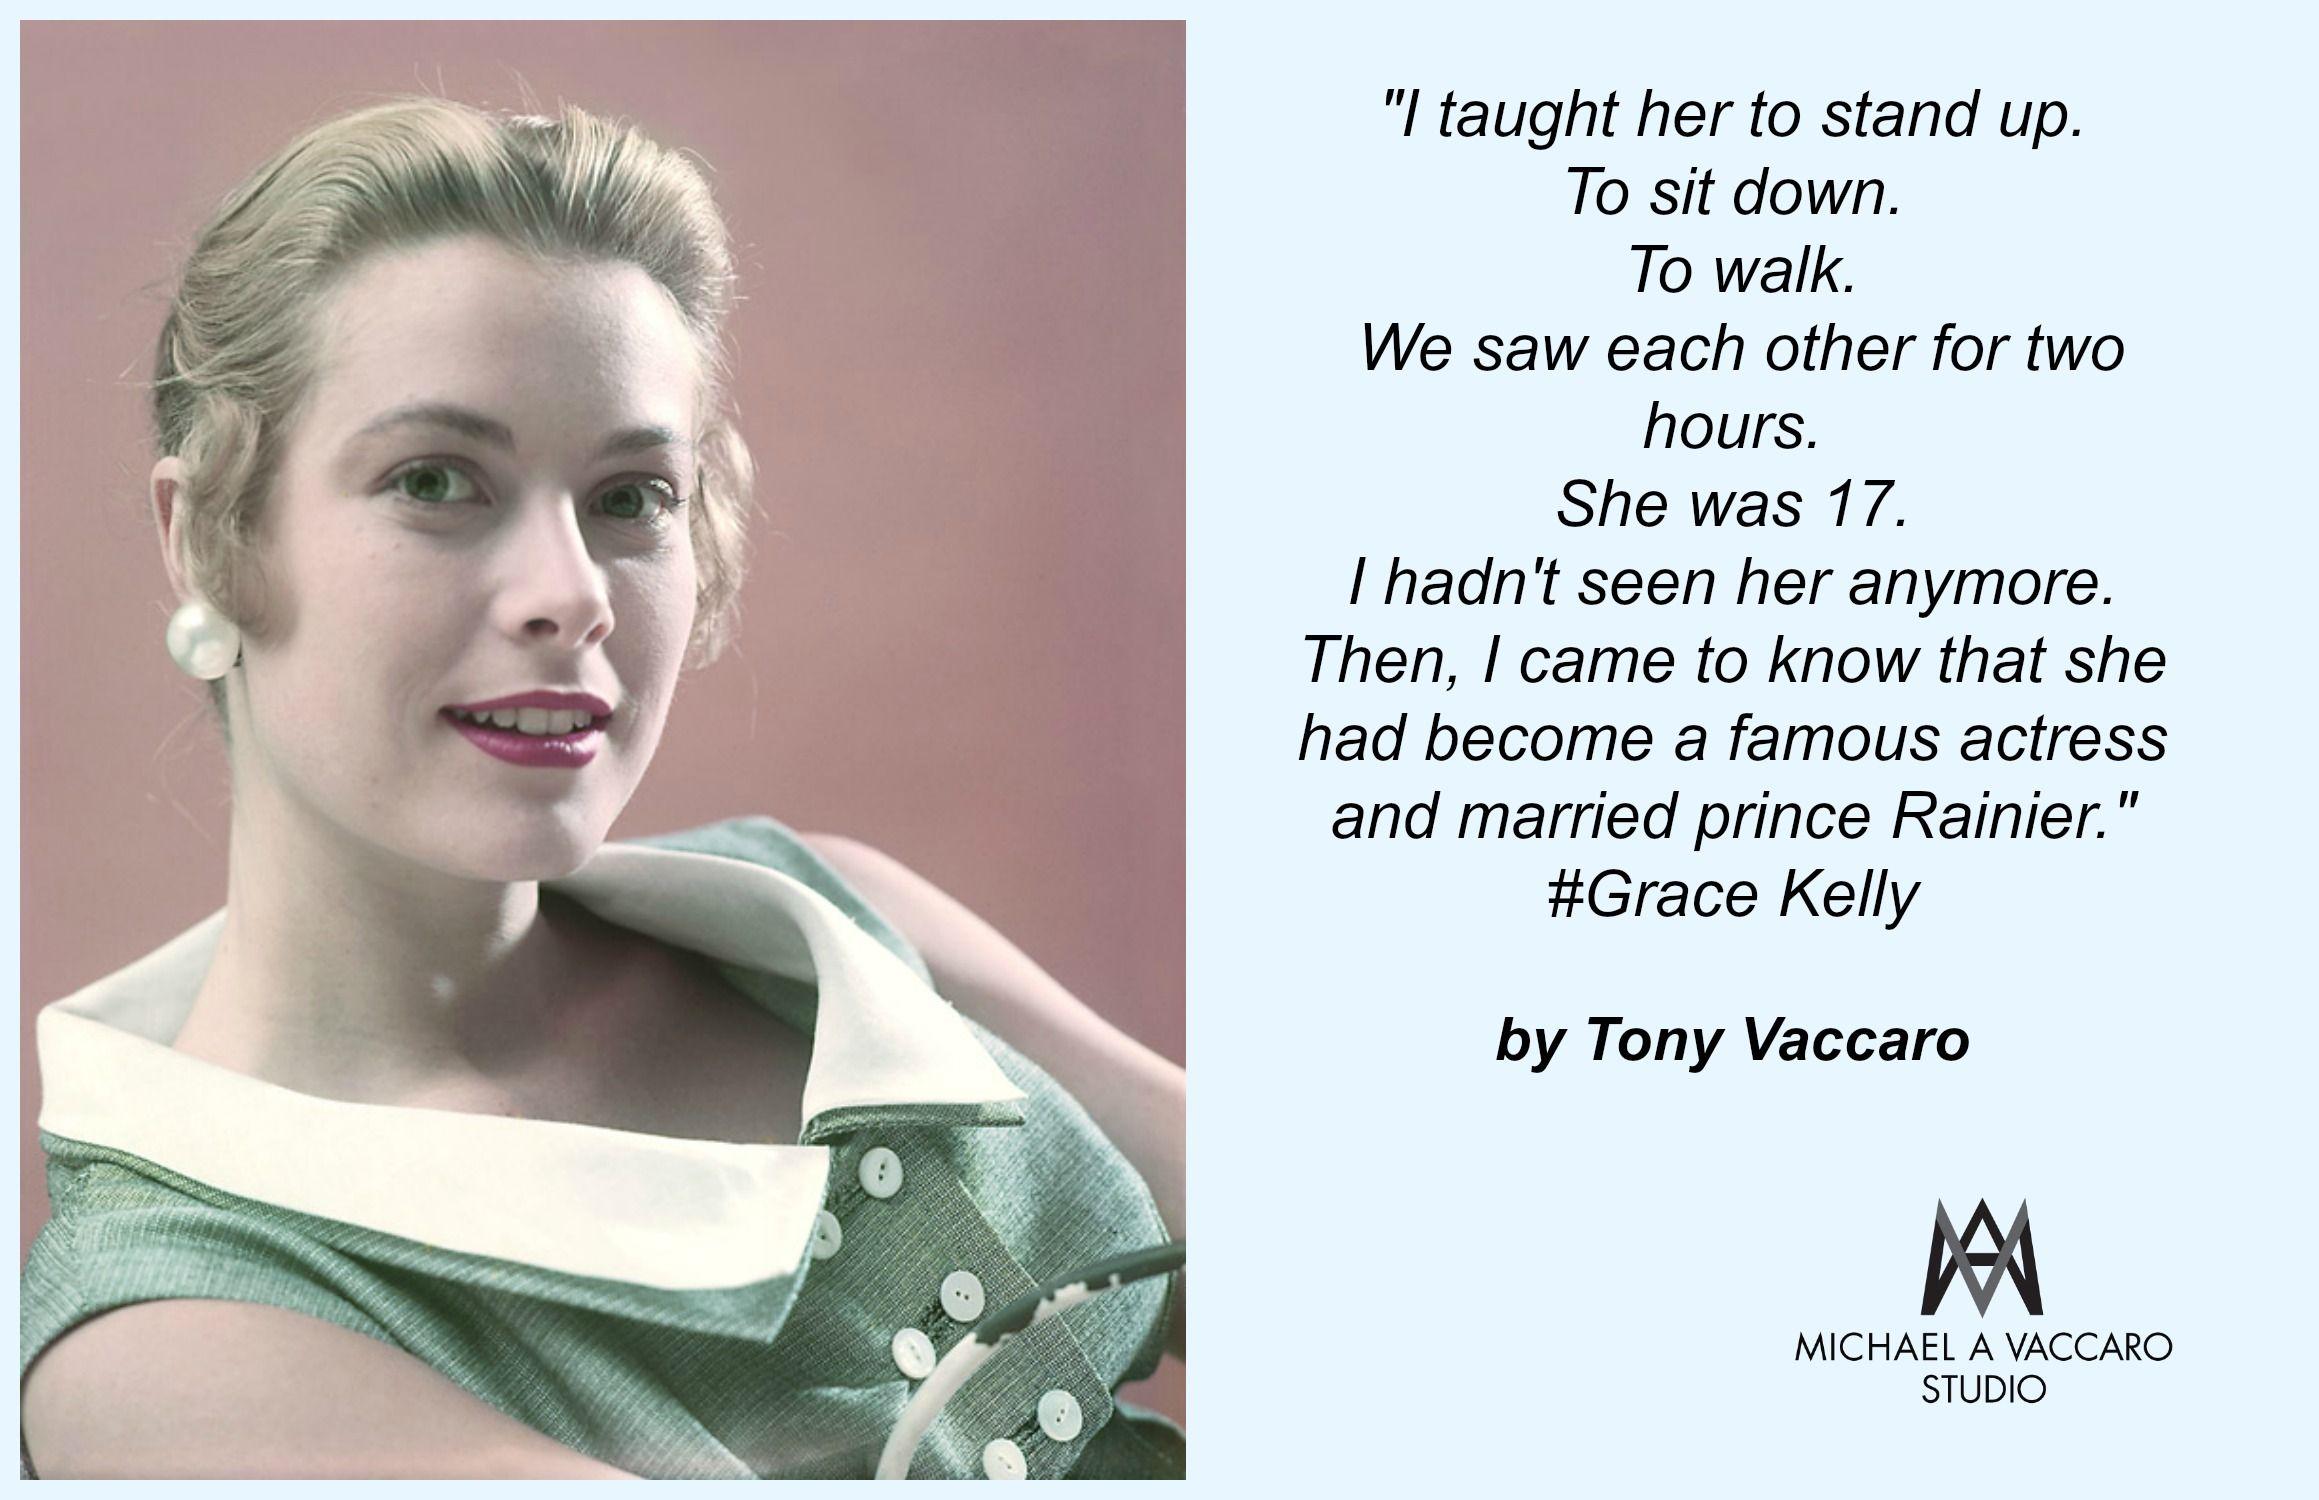 Tony Vaccaro photographed Grace Kelly